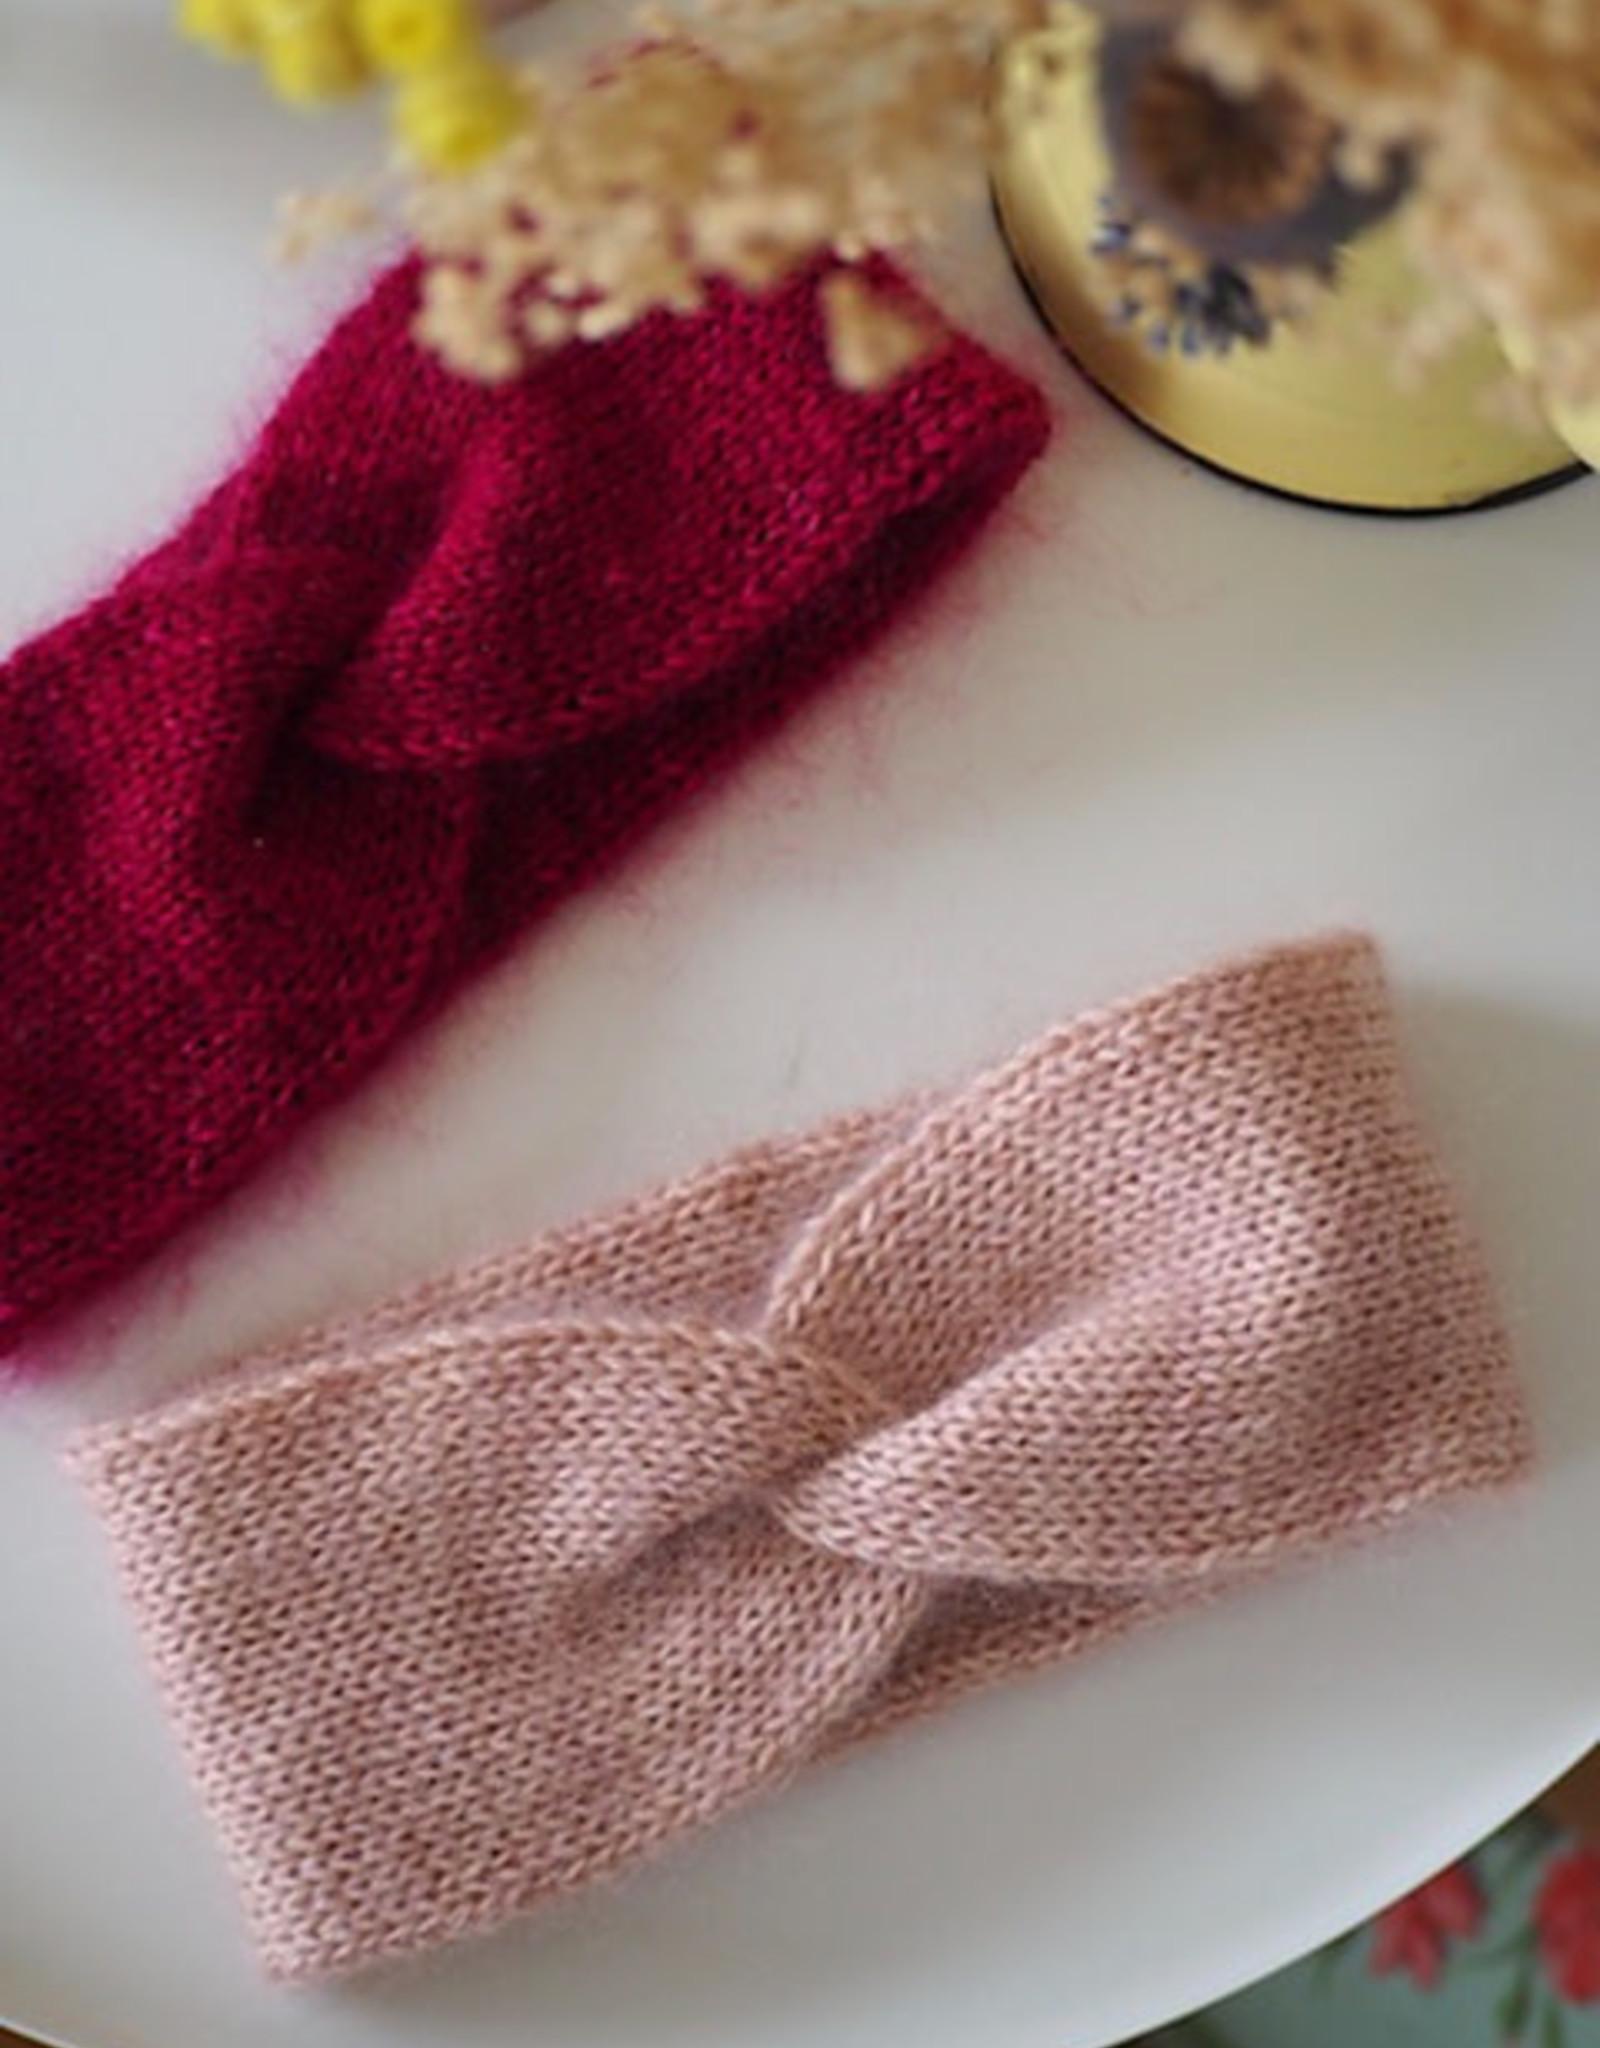 Berroco Kit prêt à tricoter - Bandeau Frida